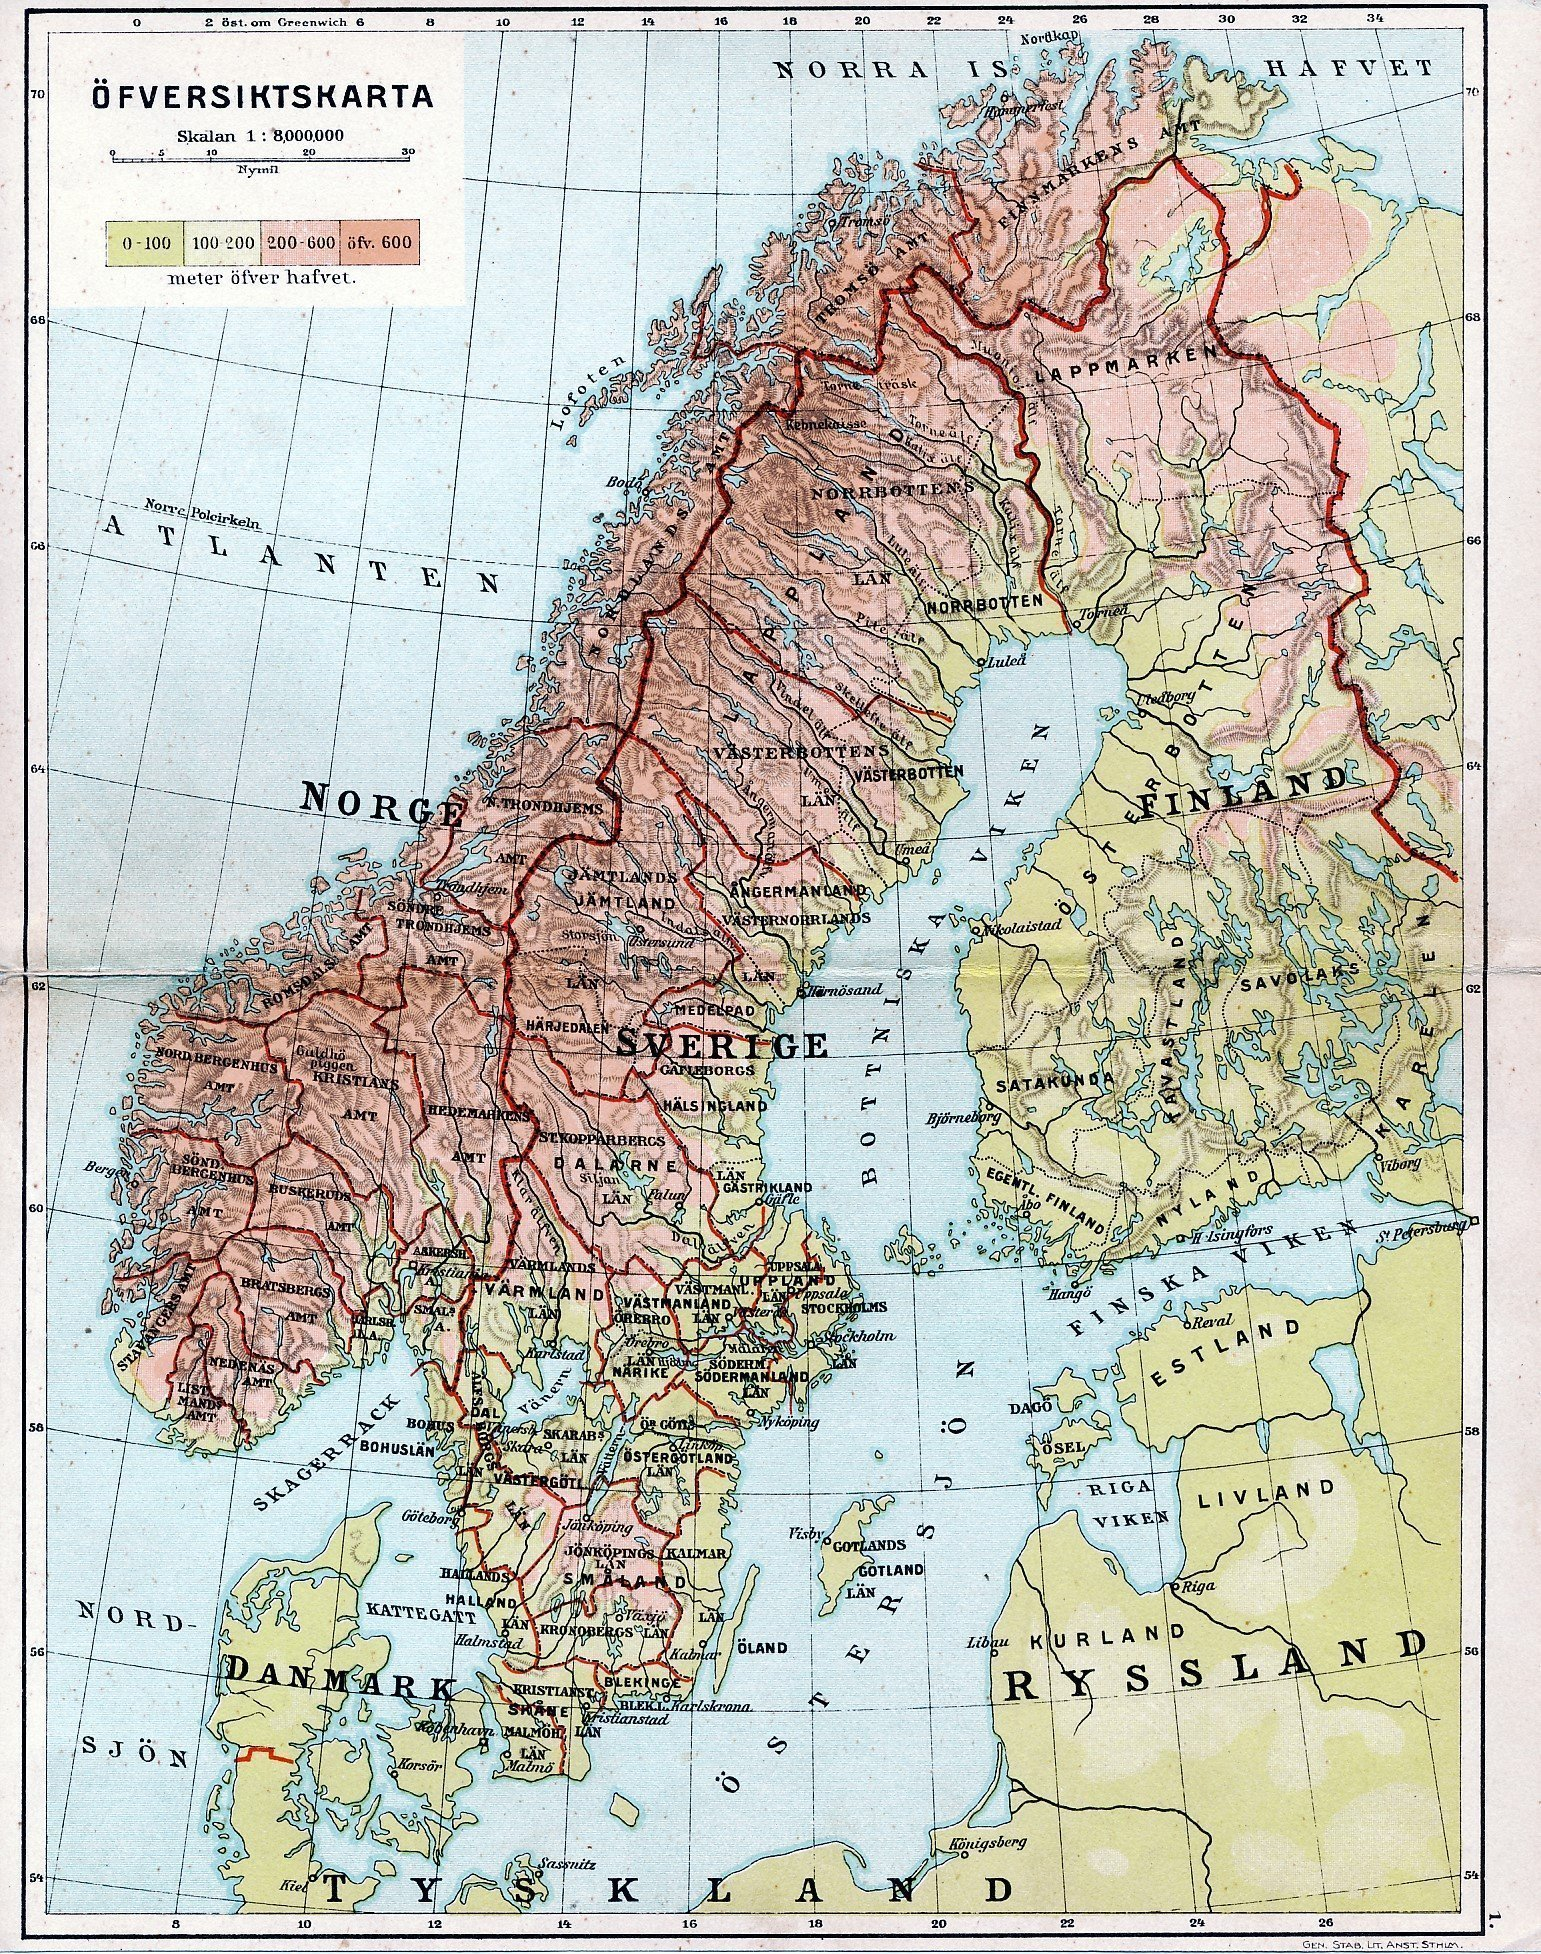 Sverige Norge Finland Danmark Ofversiktskarta 1 393559273 ᐈ